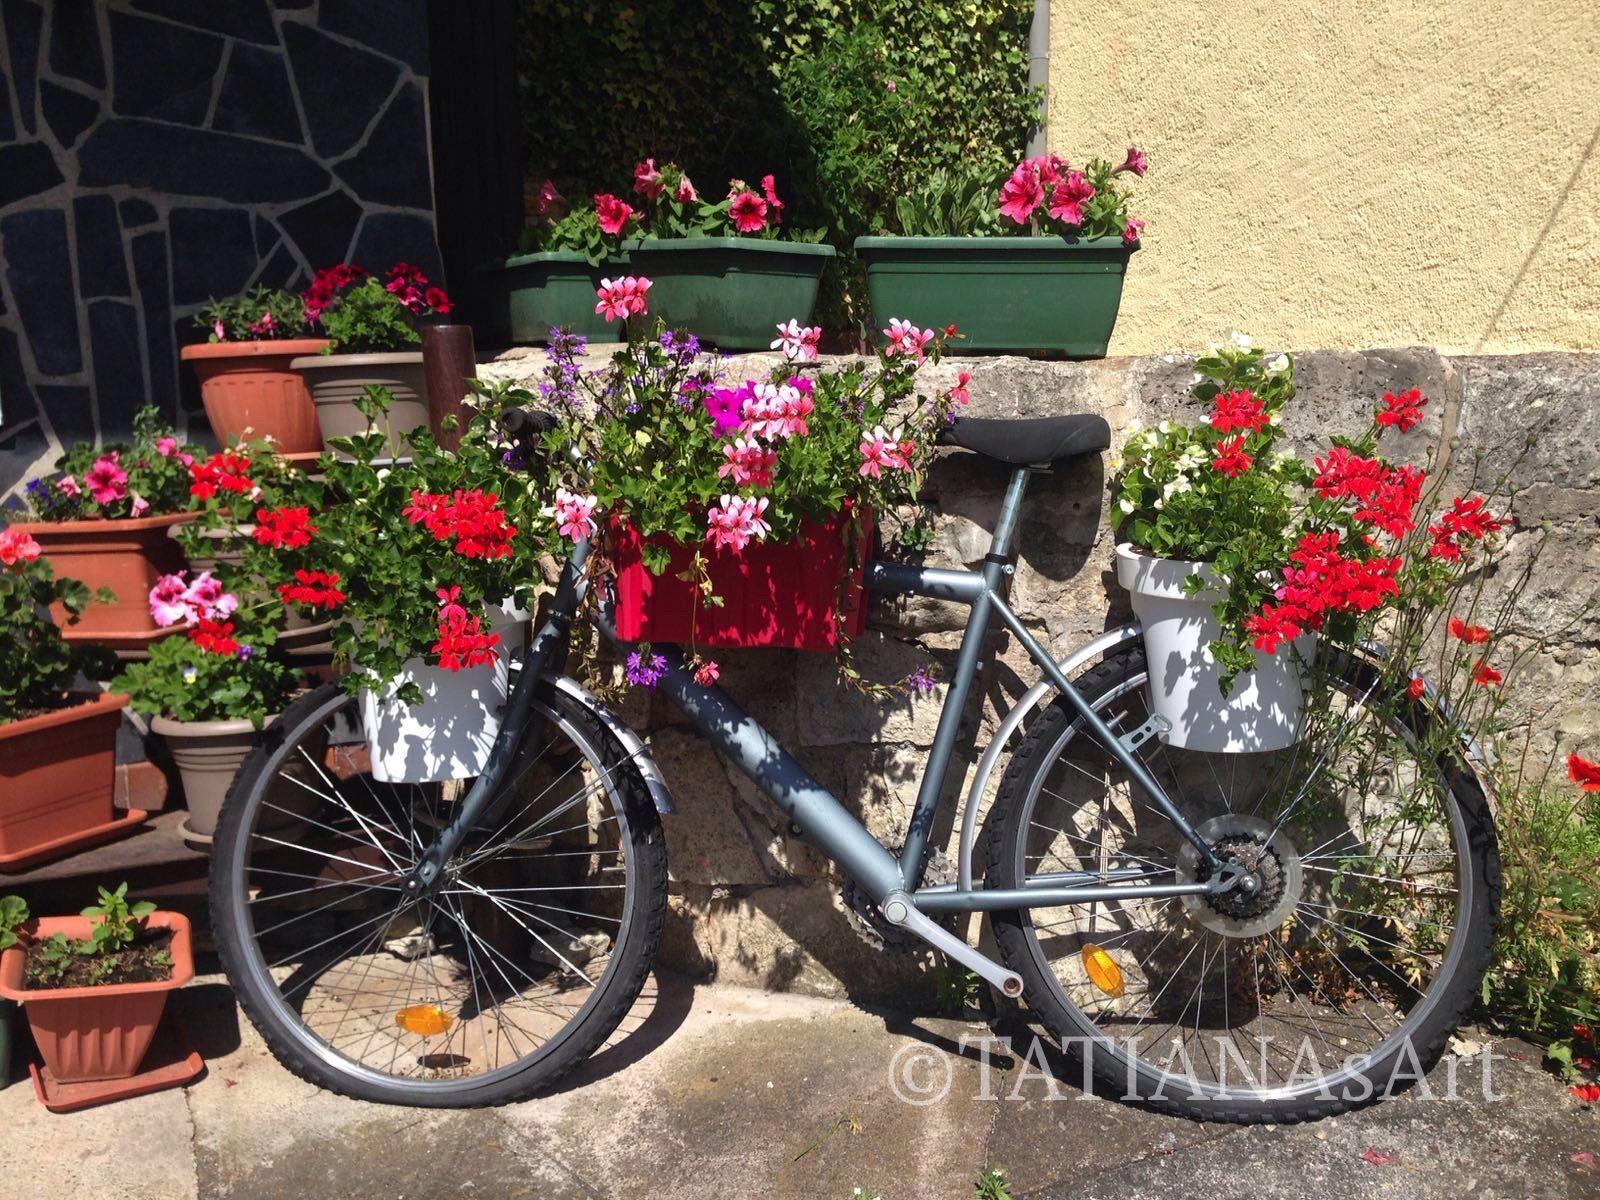 Altes fahrrad im garten tatianasart fahrrad garten dekoration neues leben der alten sachen - Dekoration fahrrad ...